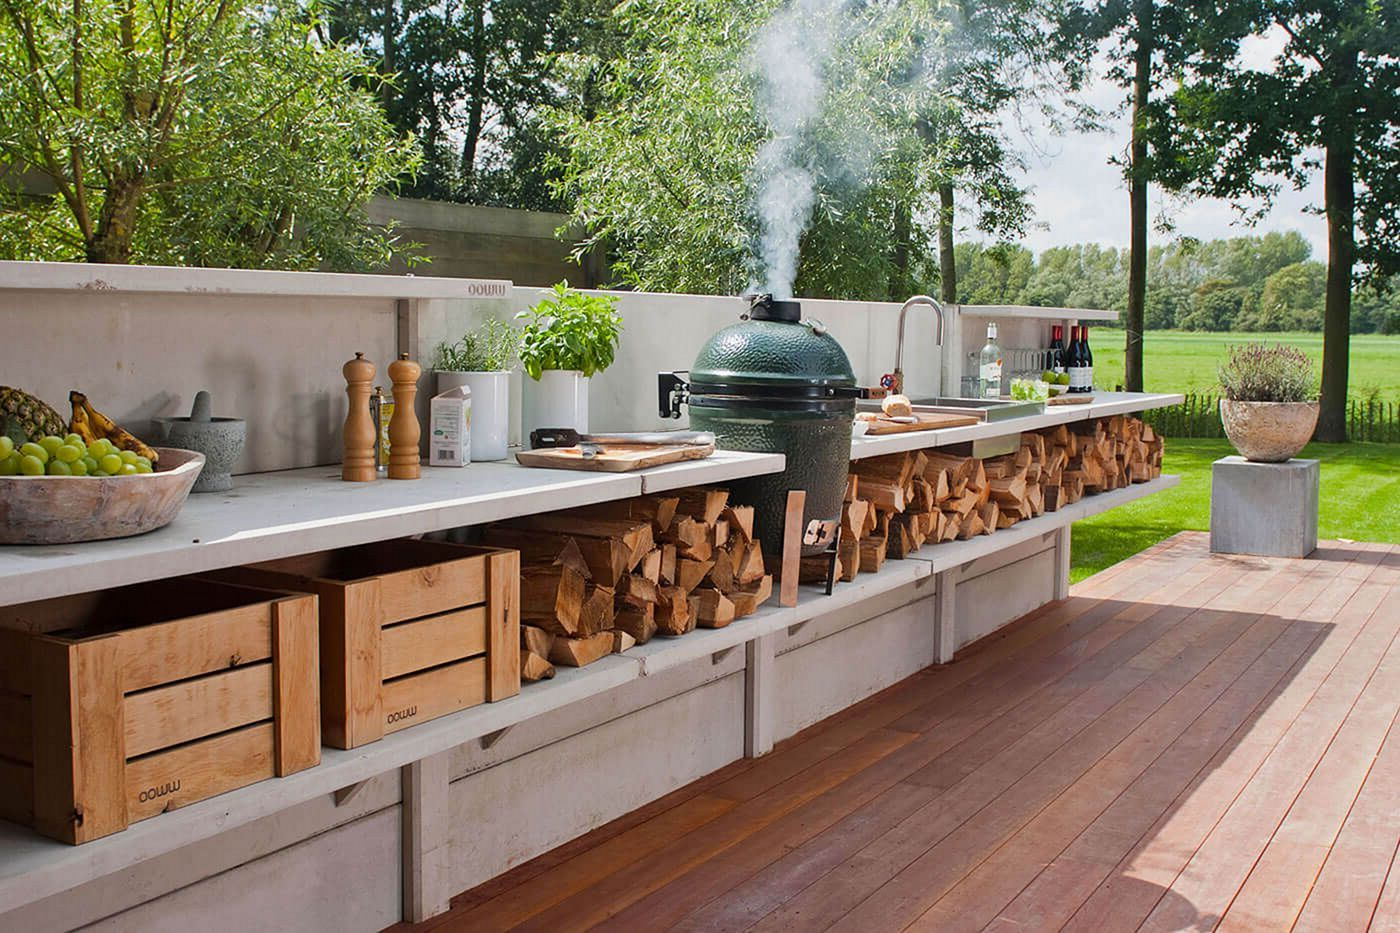 20 innovative outdoor kitchen decoration ideas that